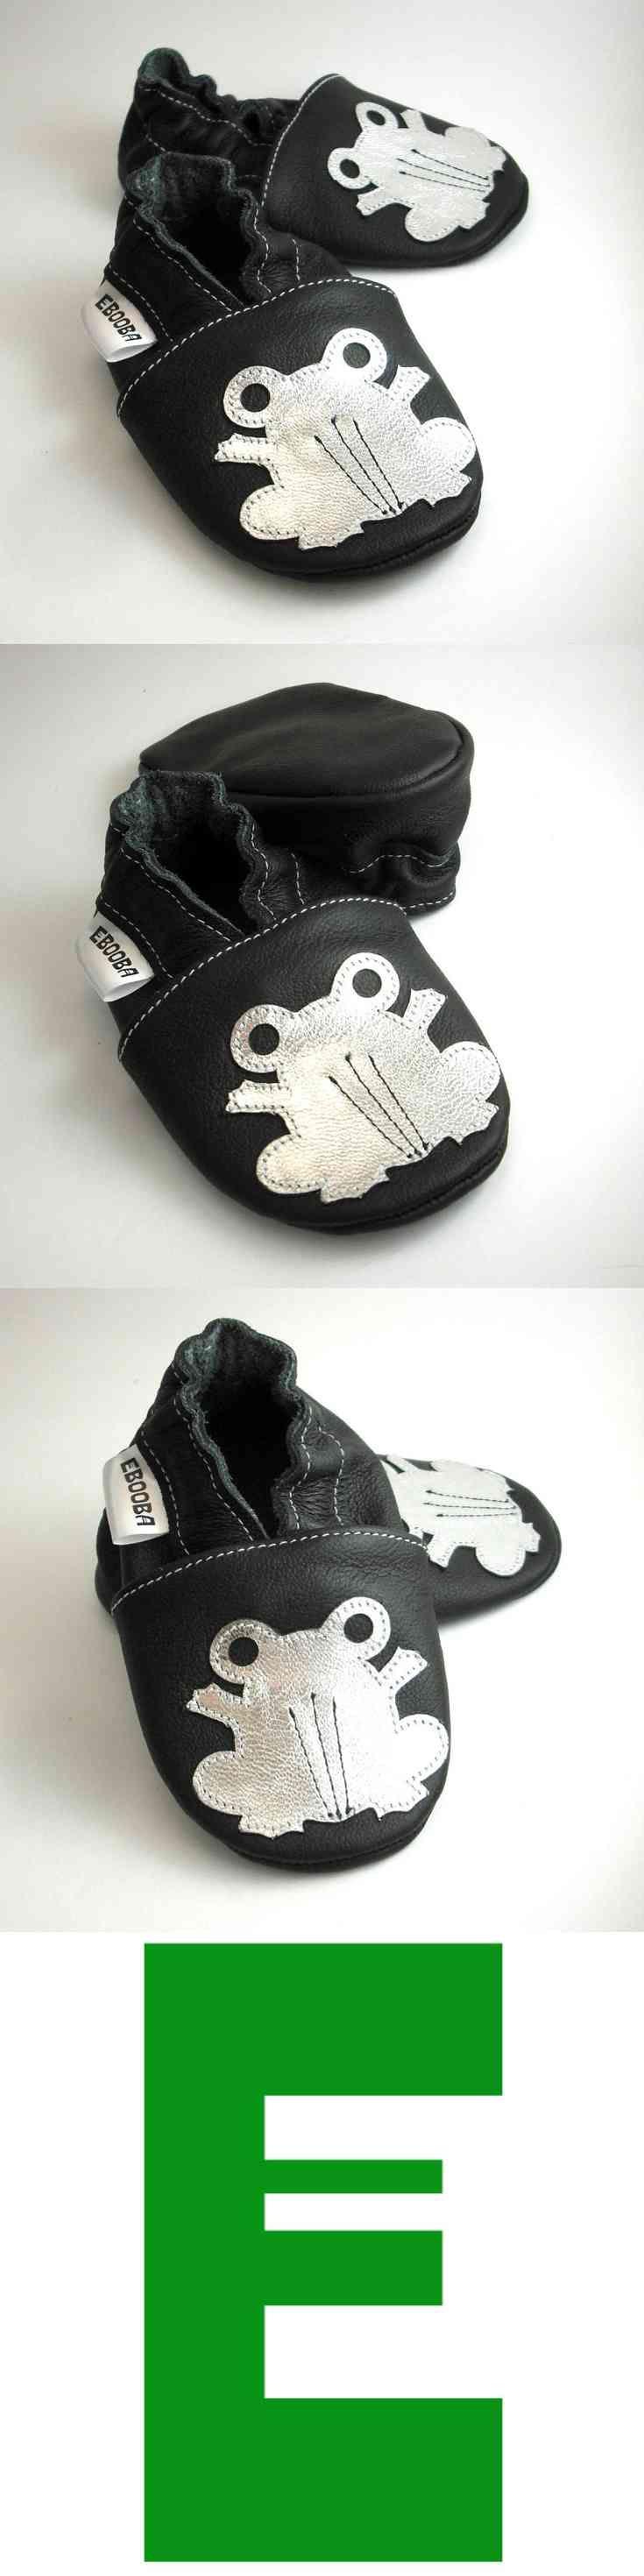 Baby Shoe Sizes European To Us mgc gas